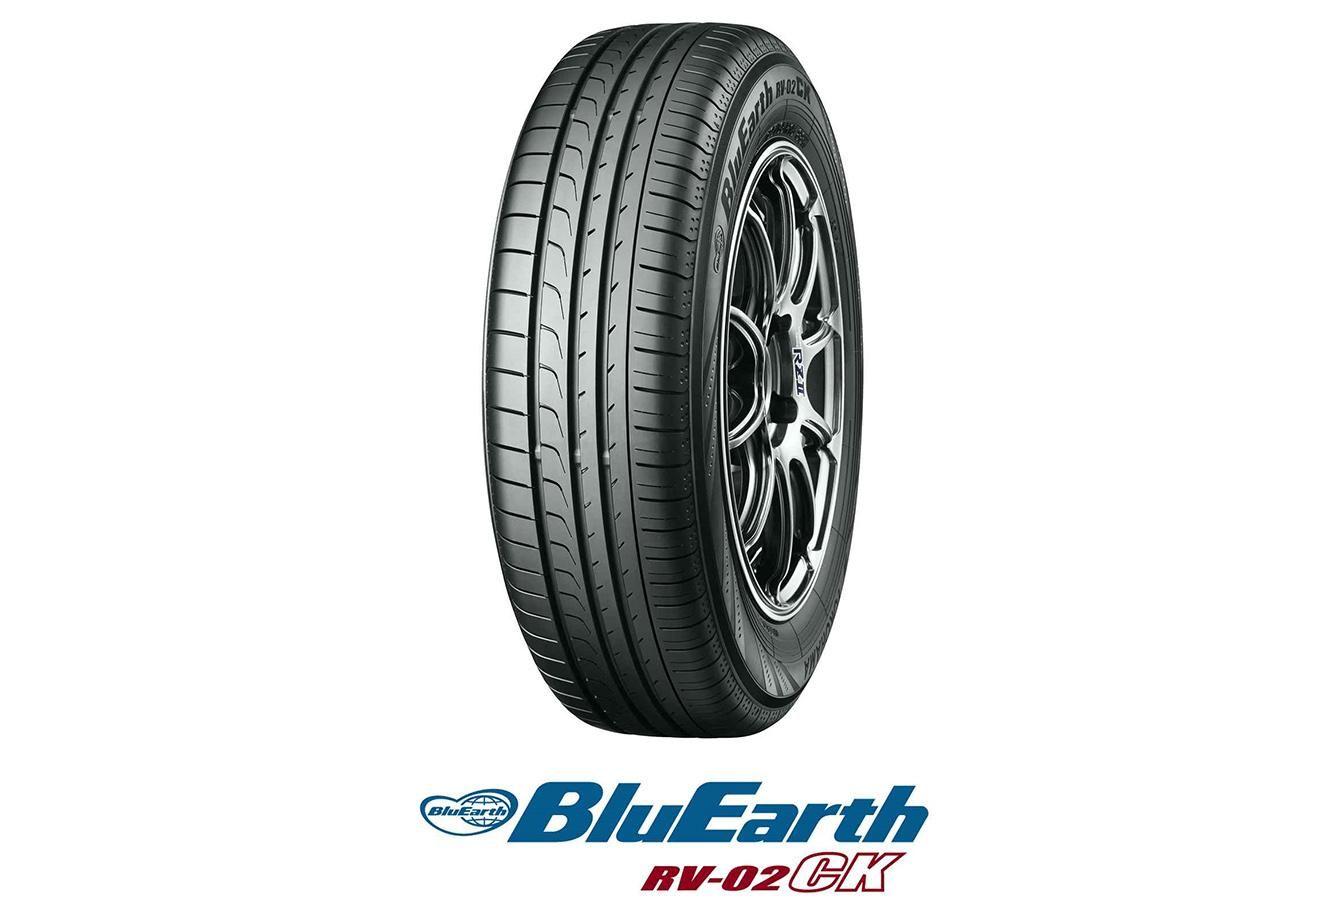 Yokohama начала продажи топливосберегающих шин BluEarth RV-02CK для микролитражек